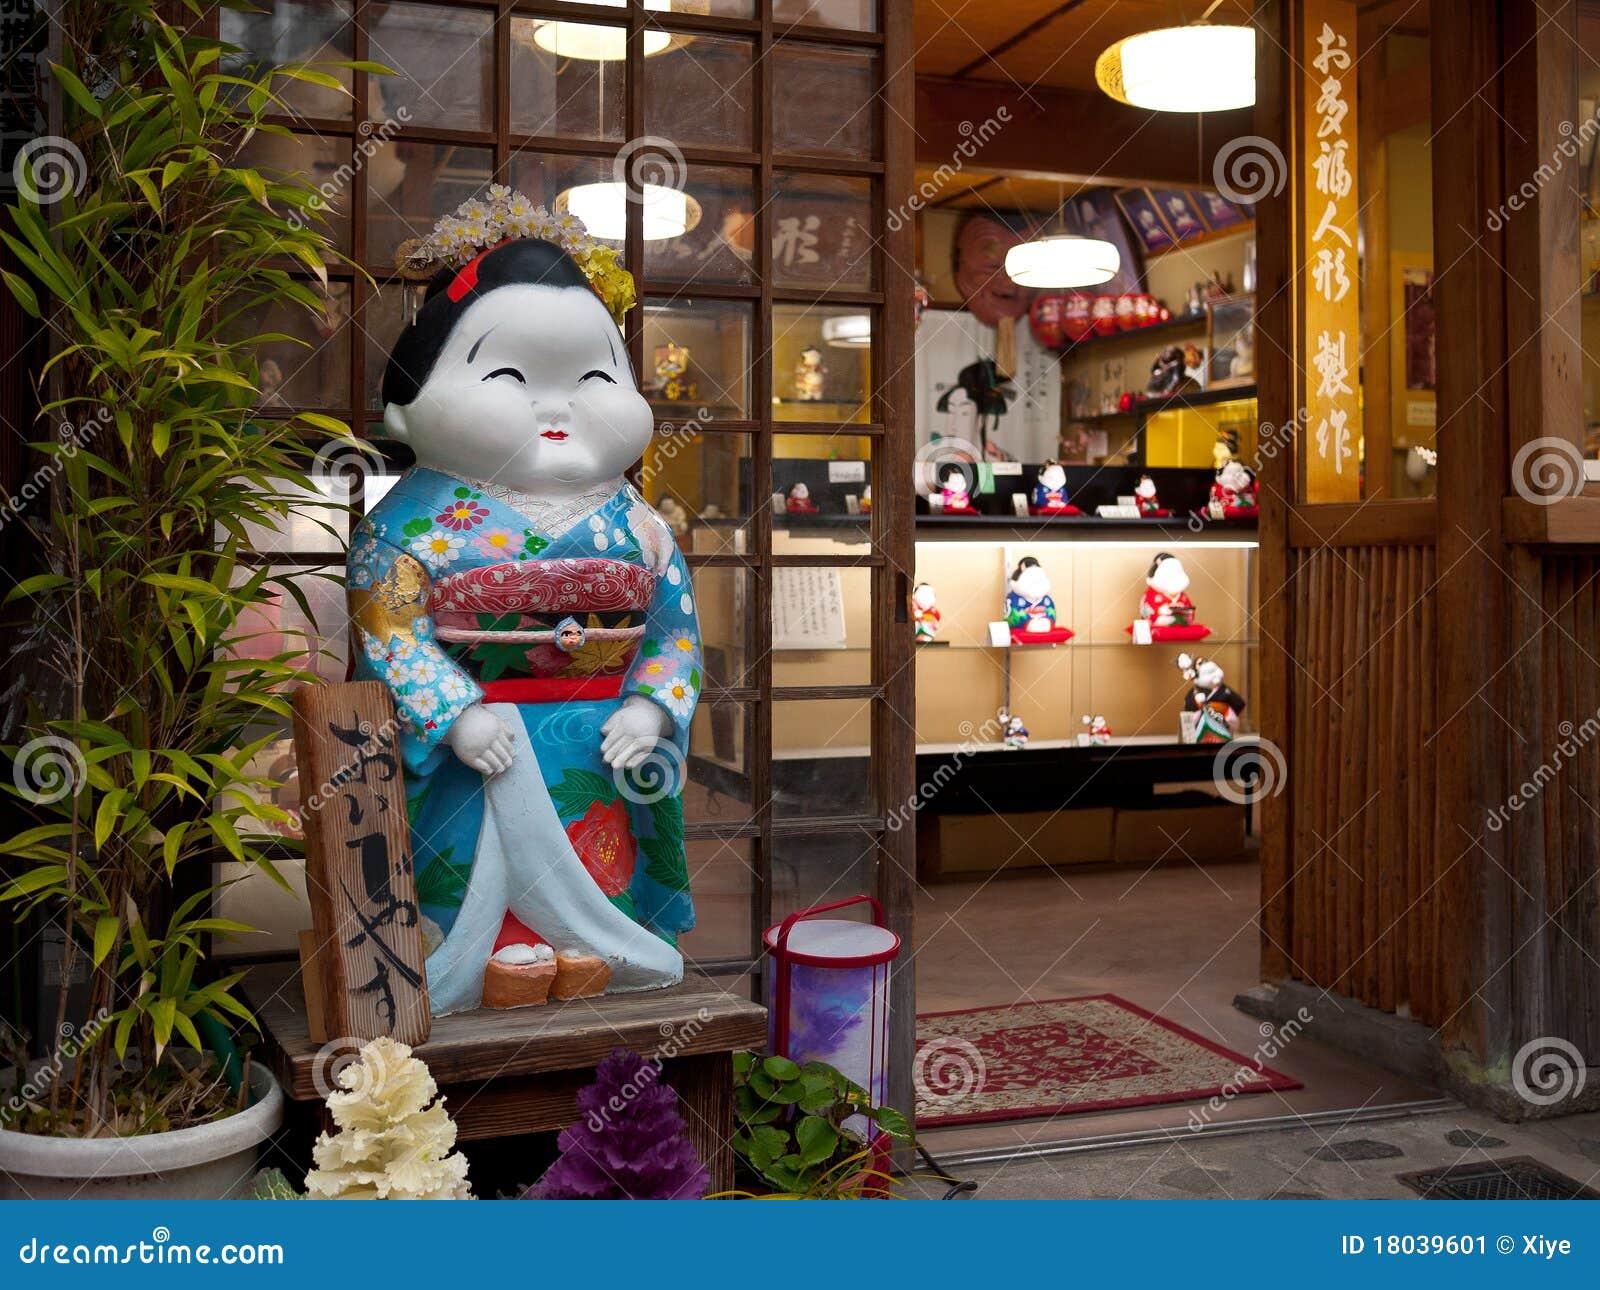 Chinese Food Store In Edinburgh